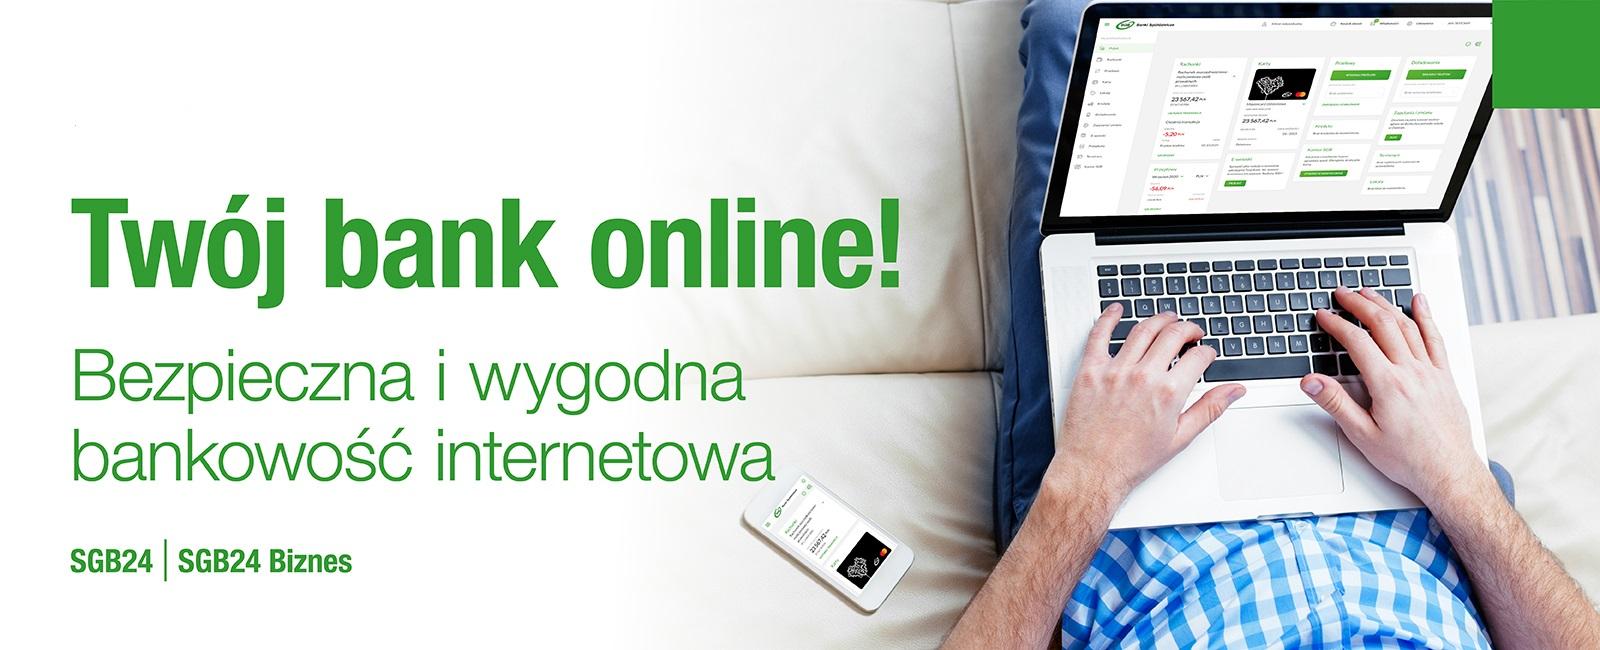 Bankowosc internetowa slyder1600x650 - Home